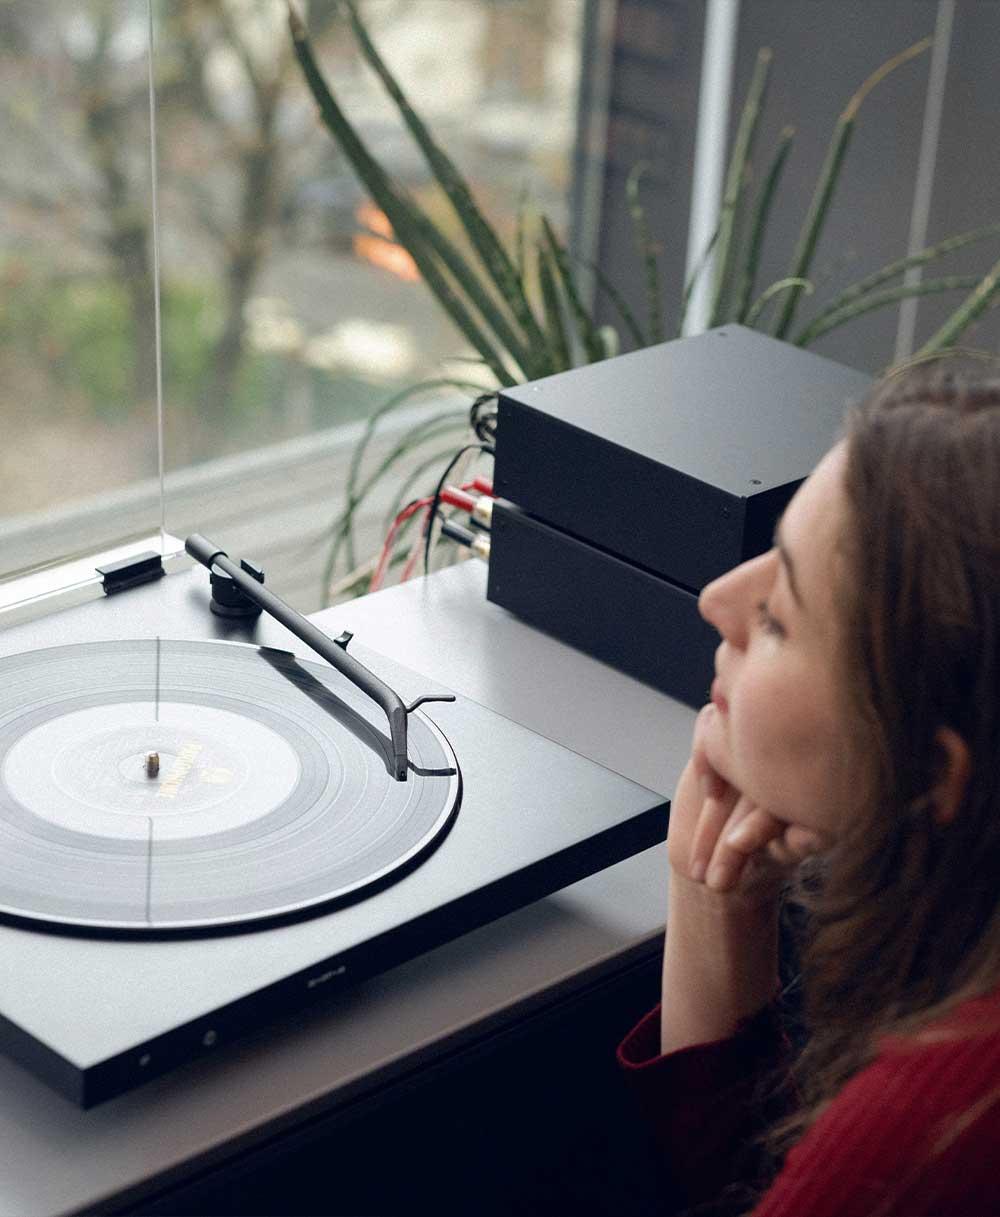 Girl enjoying music retro setup turntable